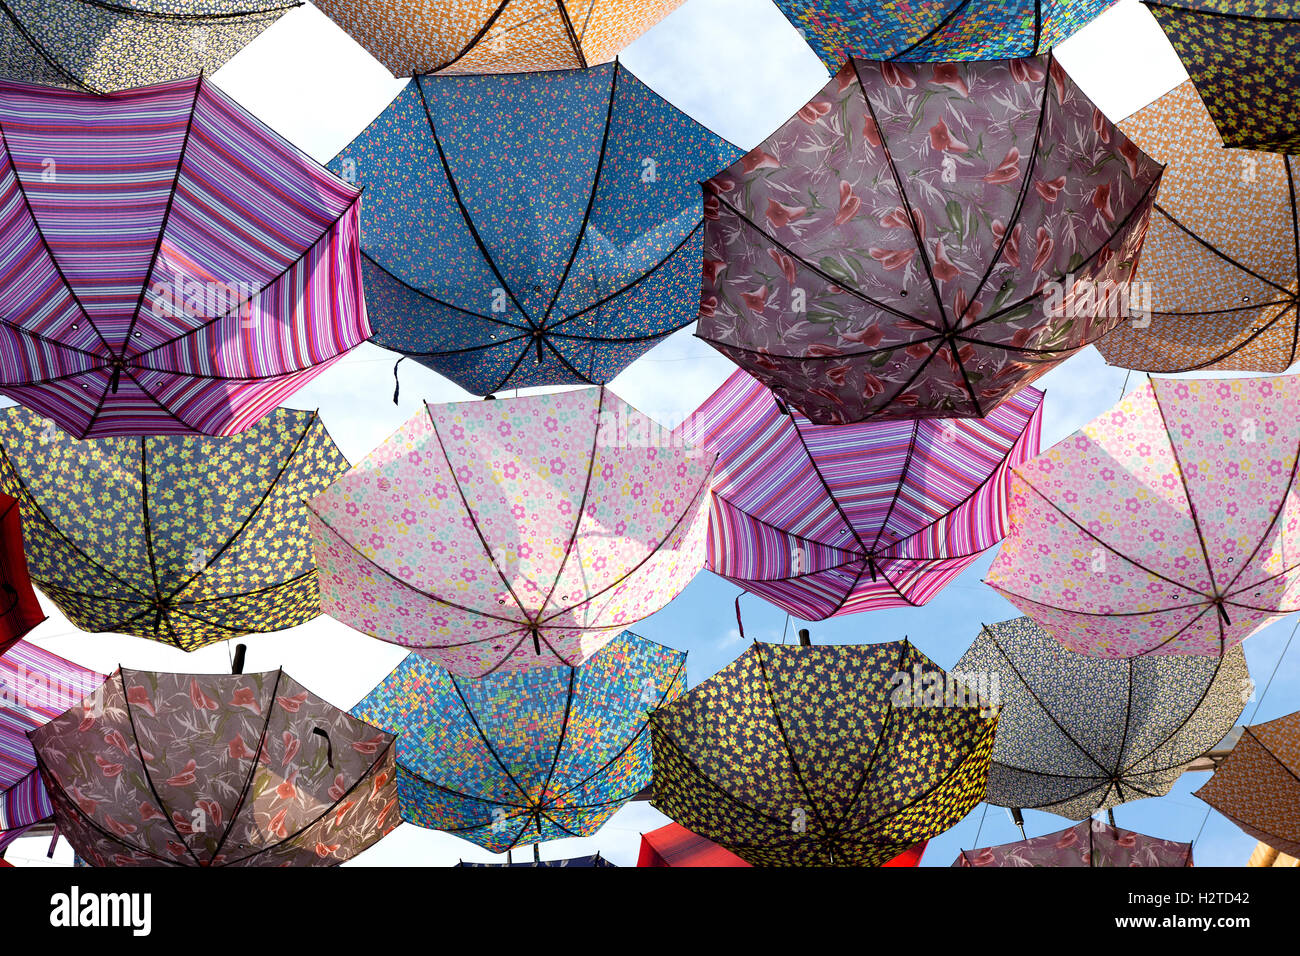 Bunte Schirme fliegen in den Himmel Stockbild